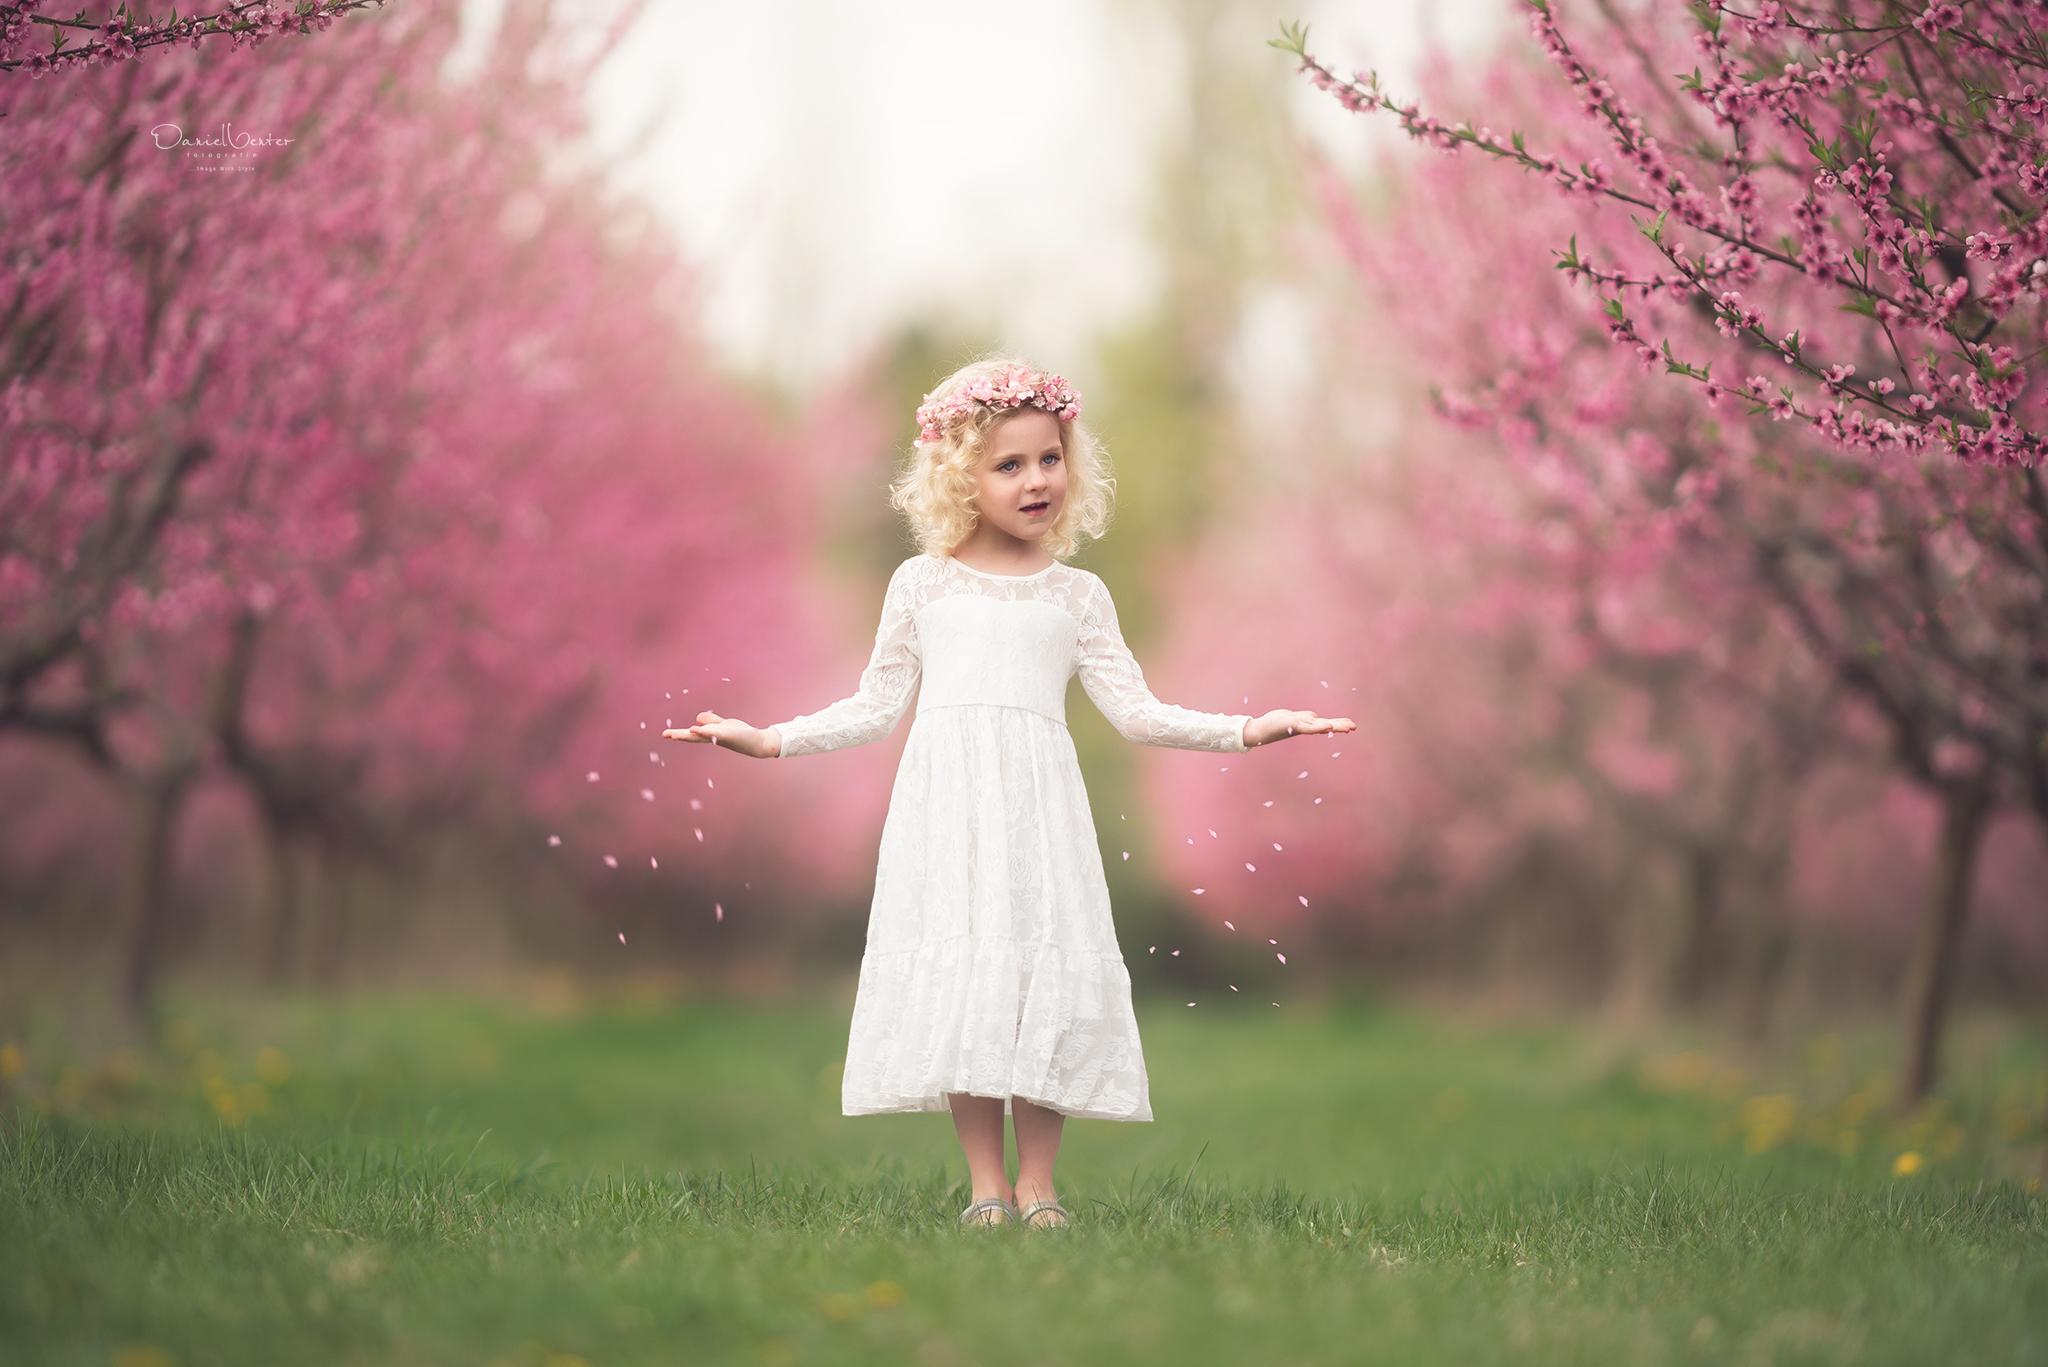 stock-photo-spring-cometh-207463463.jpg